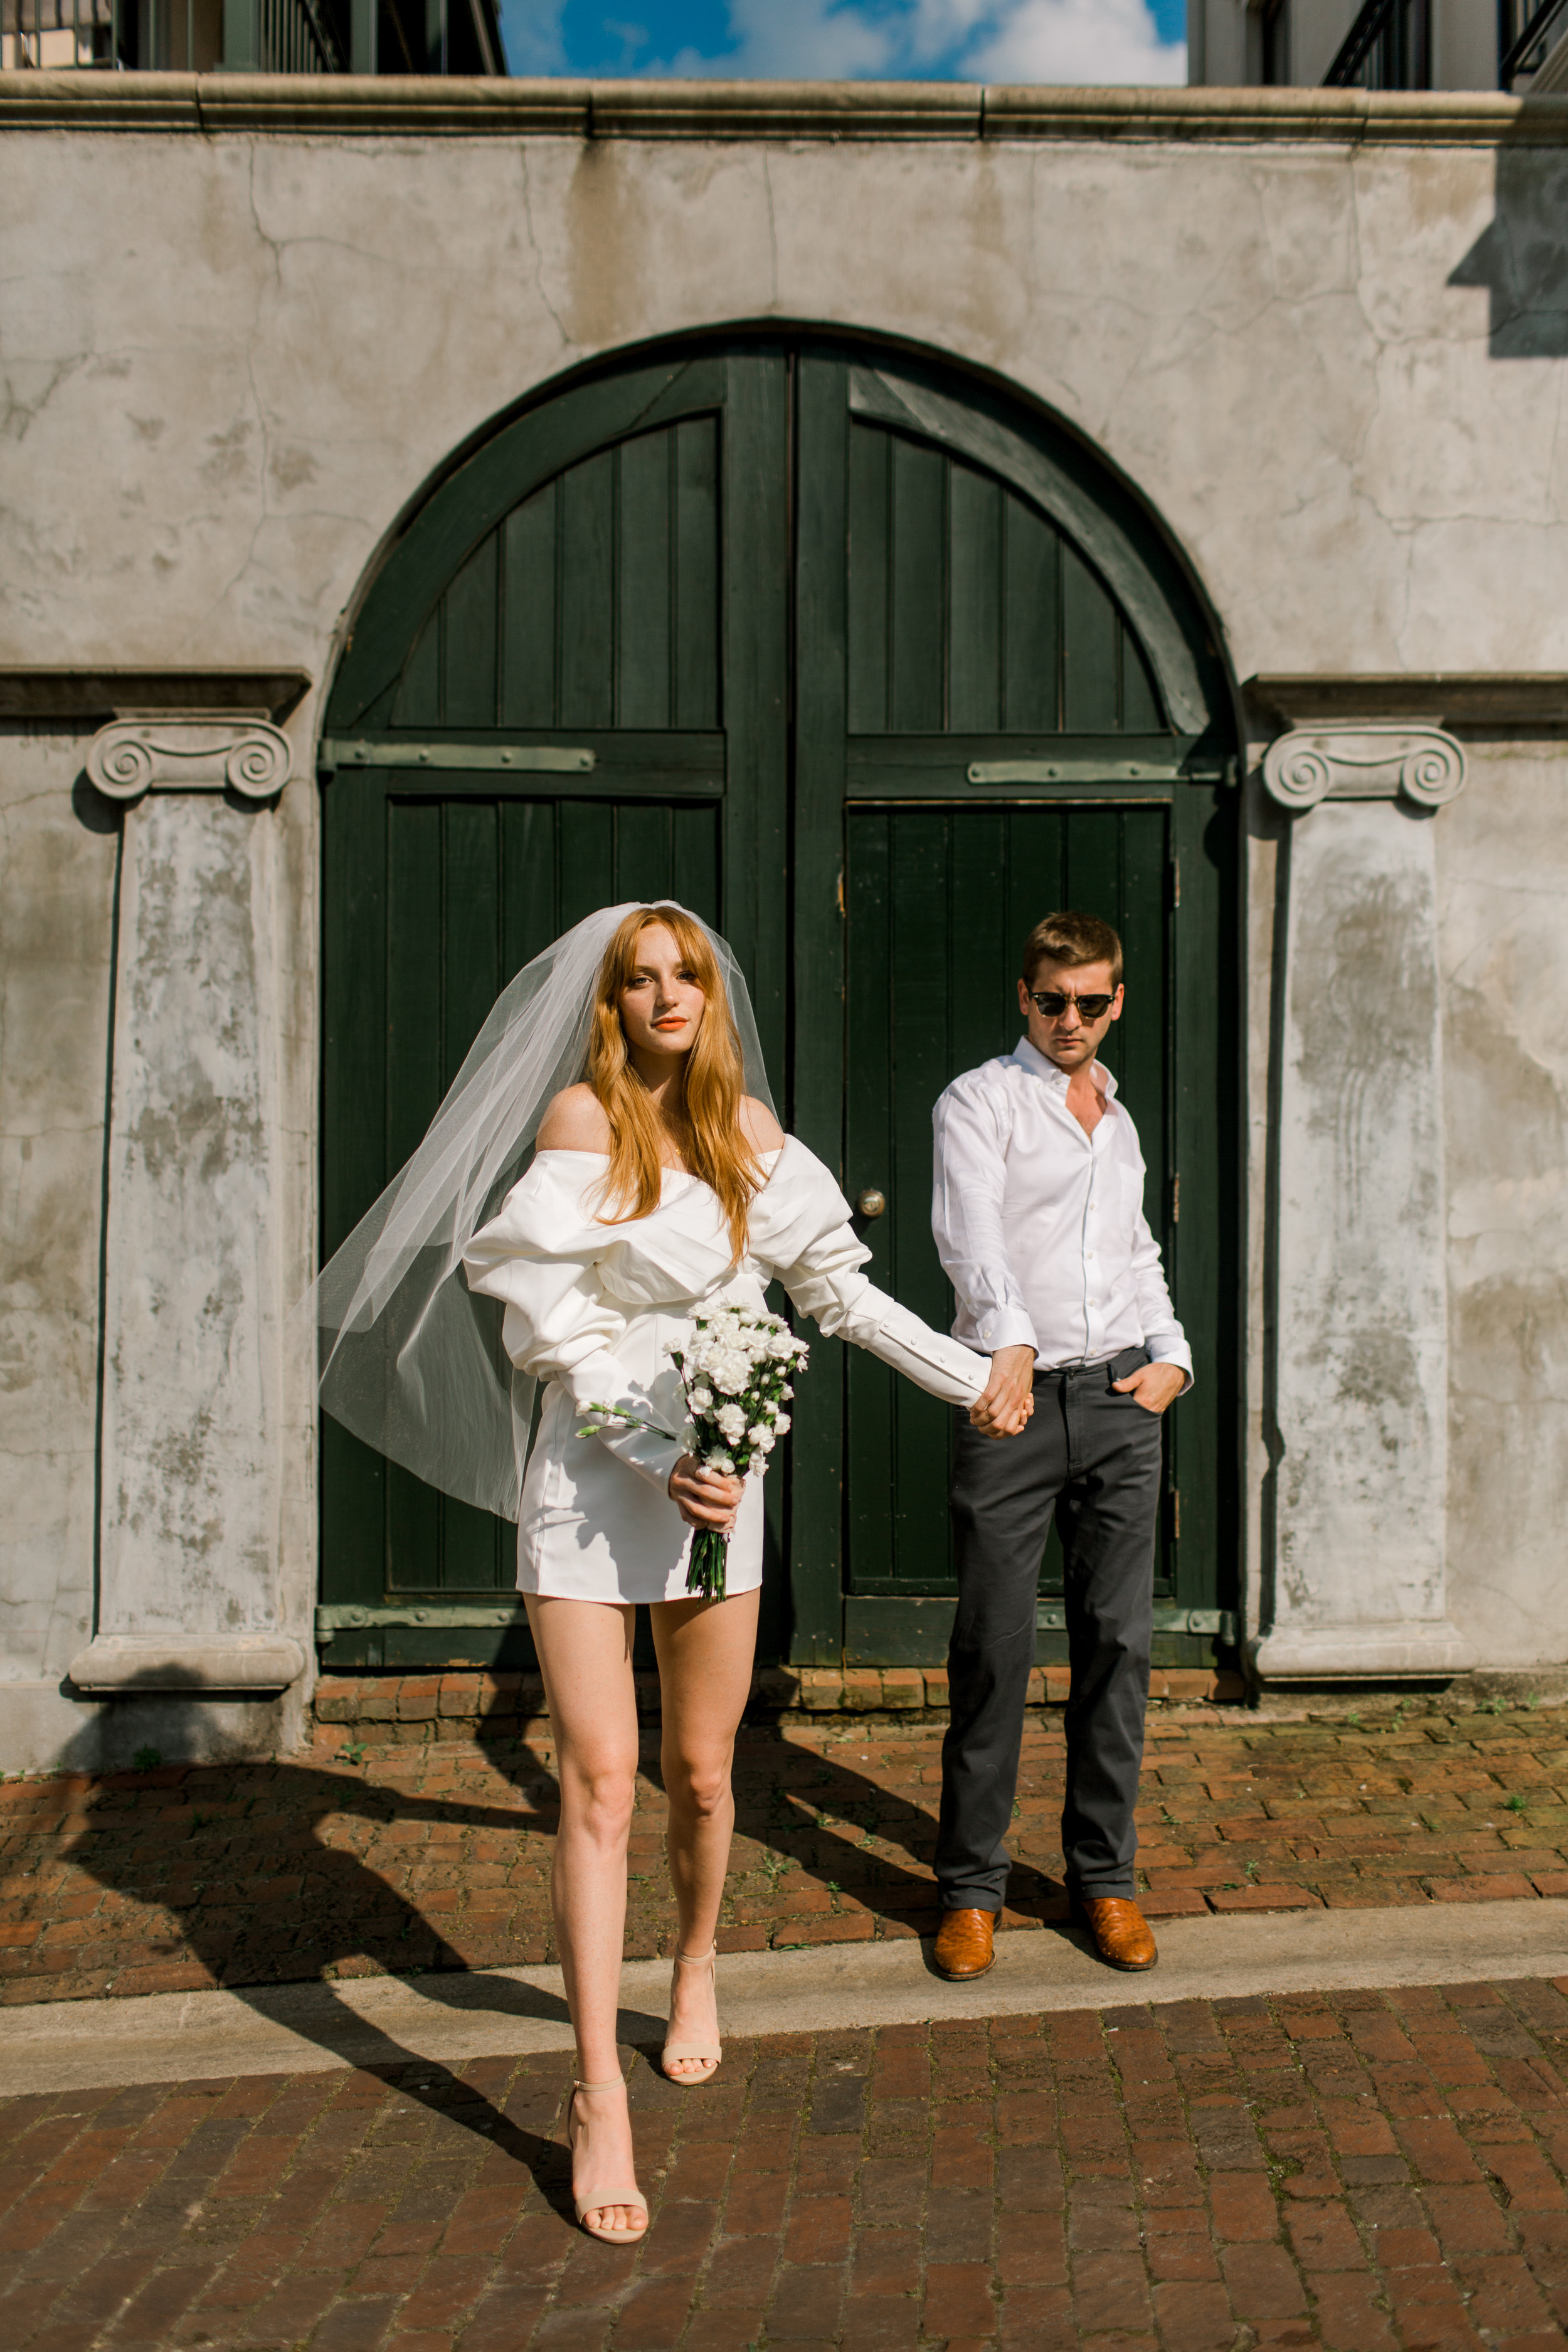 Gabriella Dress (GM) / Veil (It's a Date) / Shirt (Reed's) / Pants (Dakota Grizzly GM)